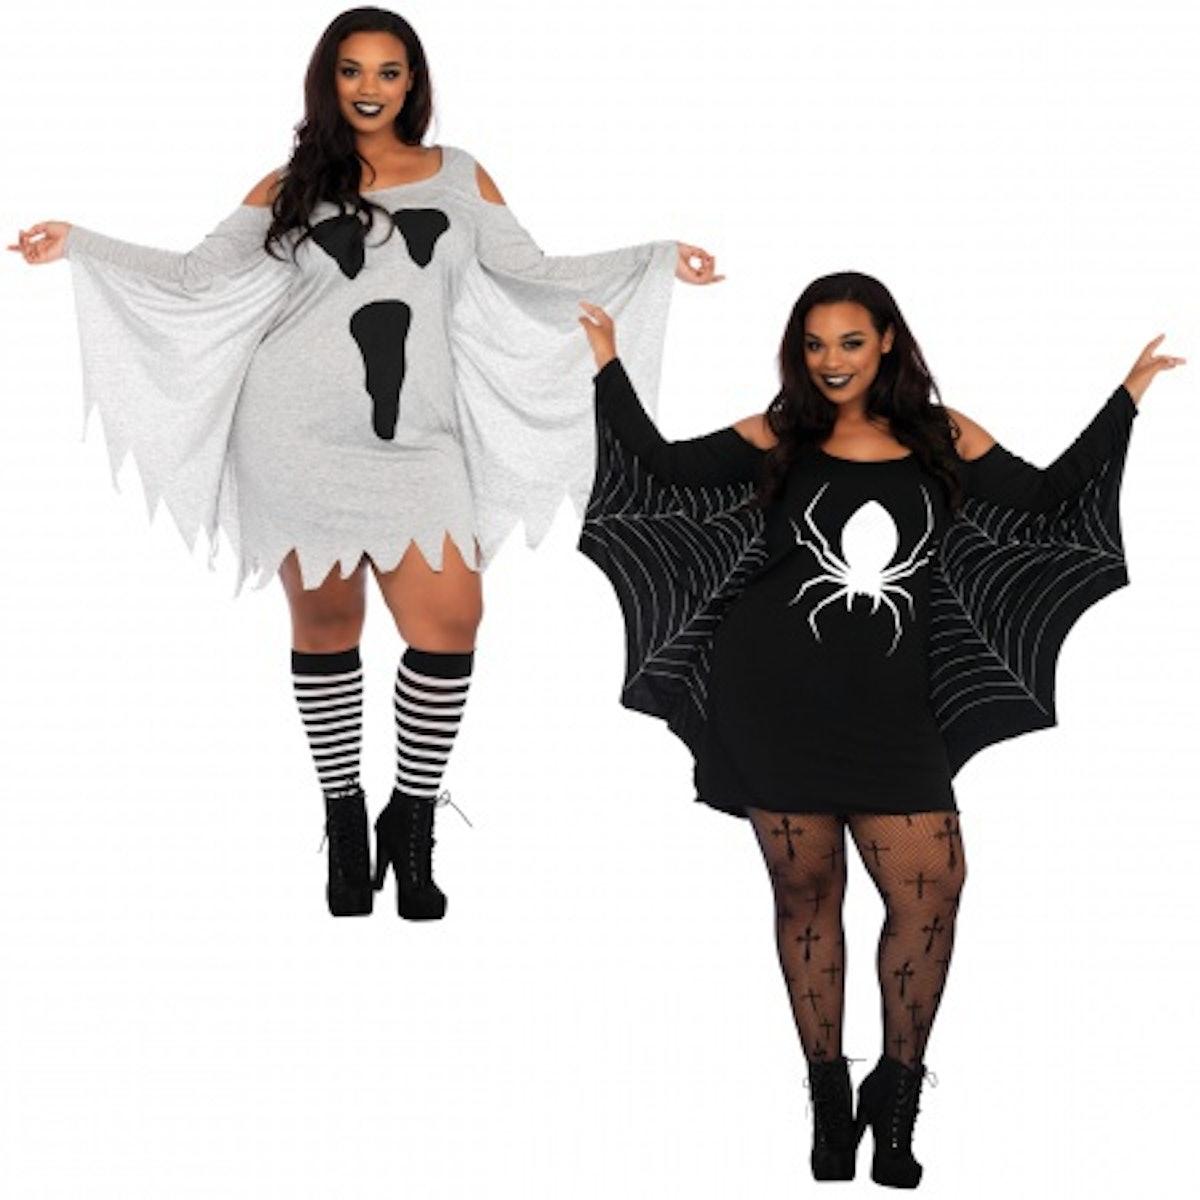 7th Avenue Costumes Halloween Jersey Dress Costume